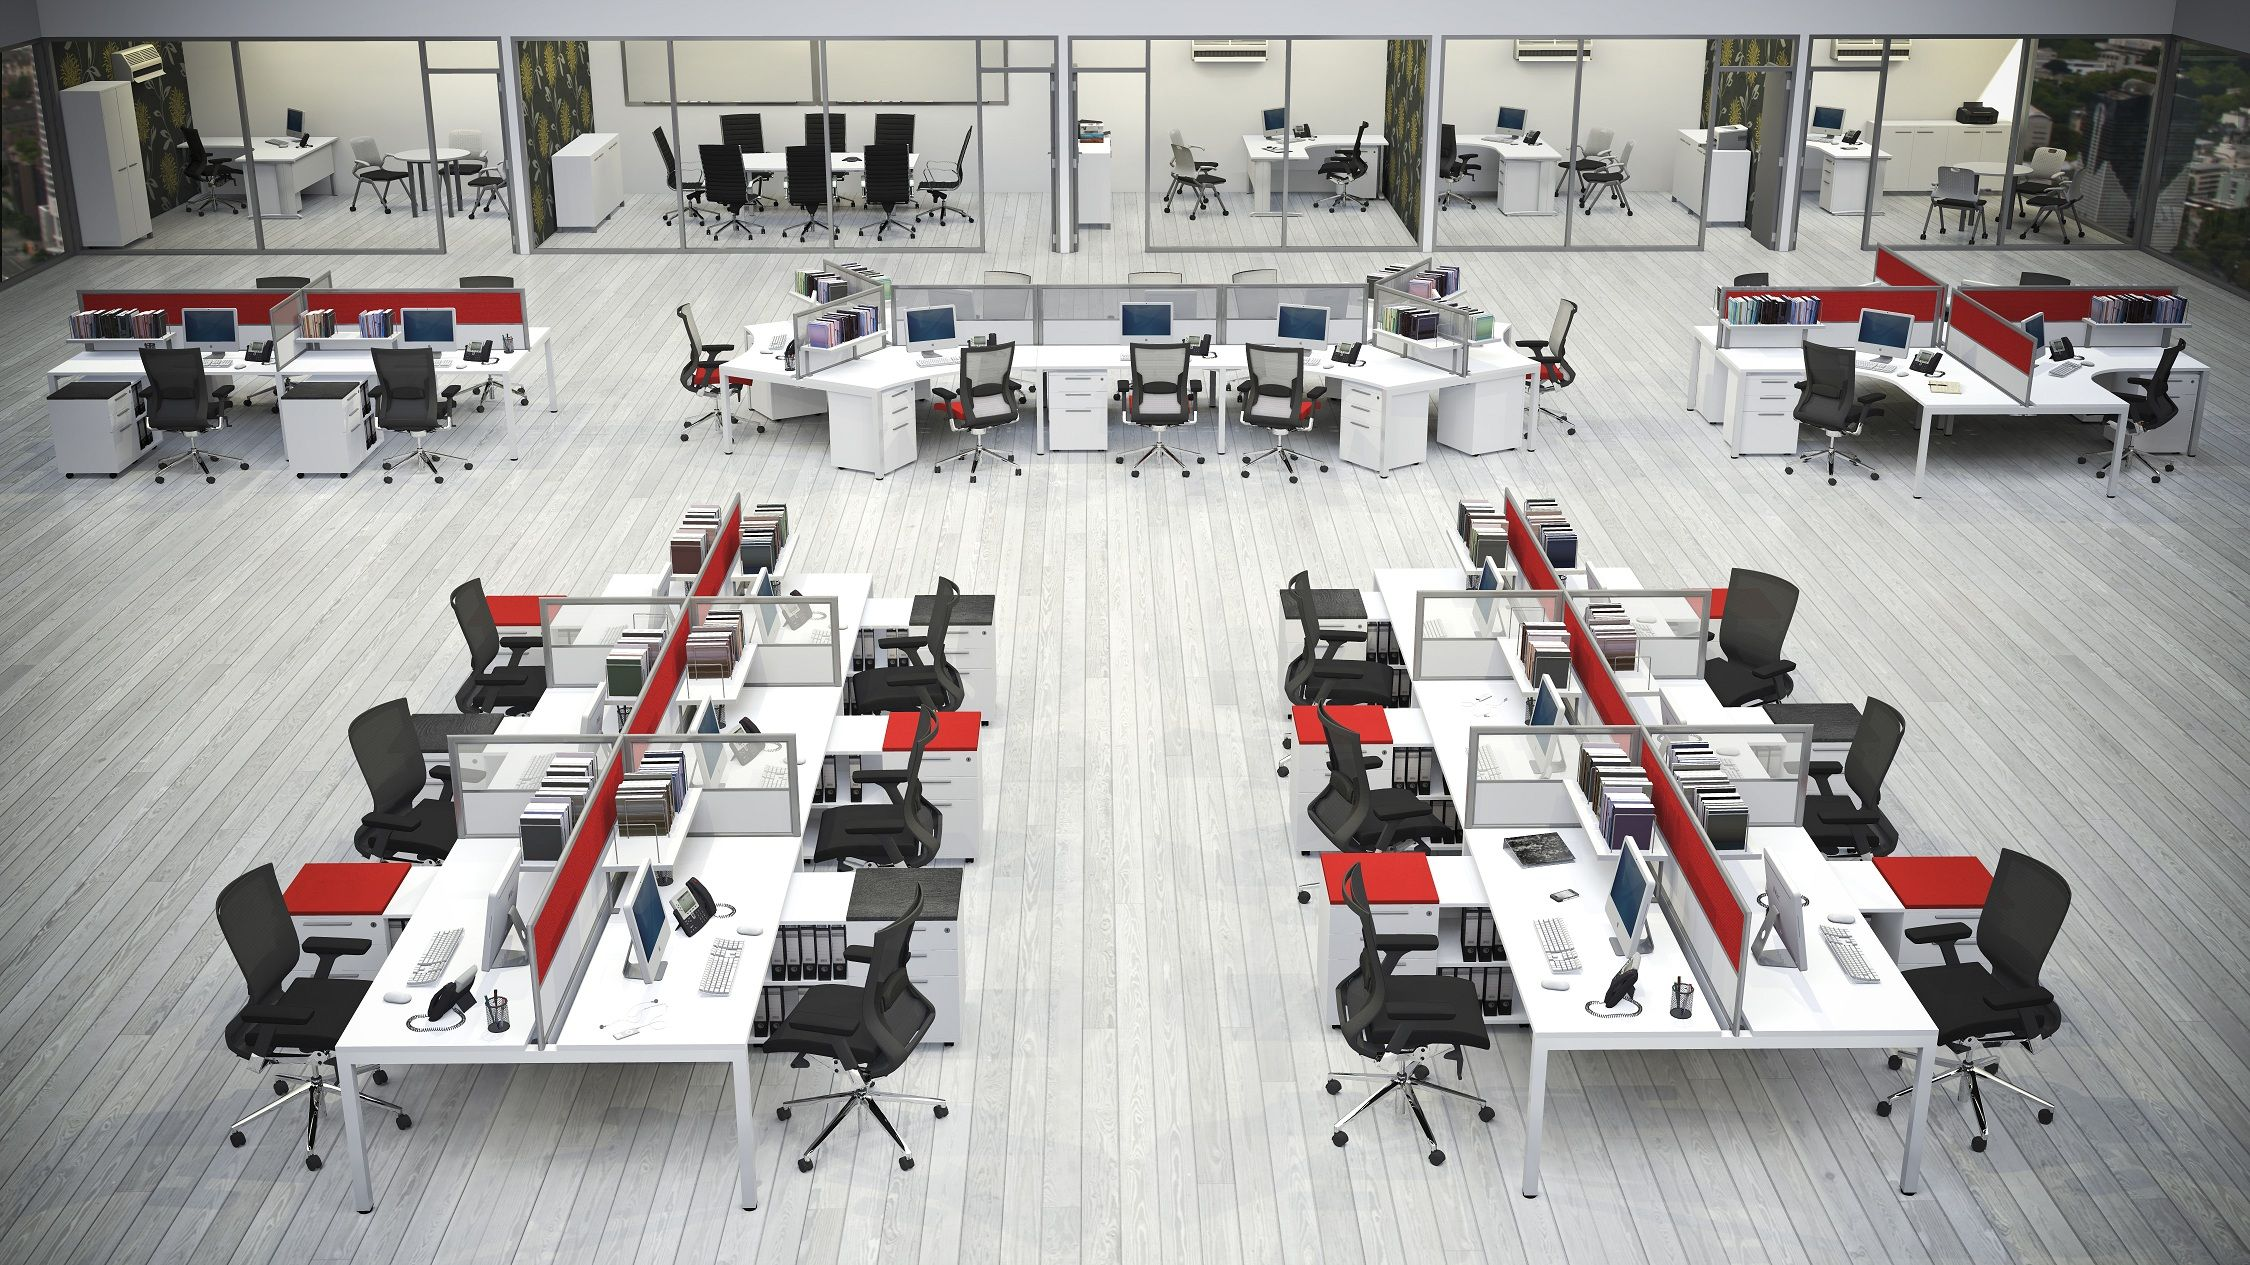 office desk layout. Office Desk Layout - Google Search S